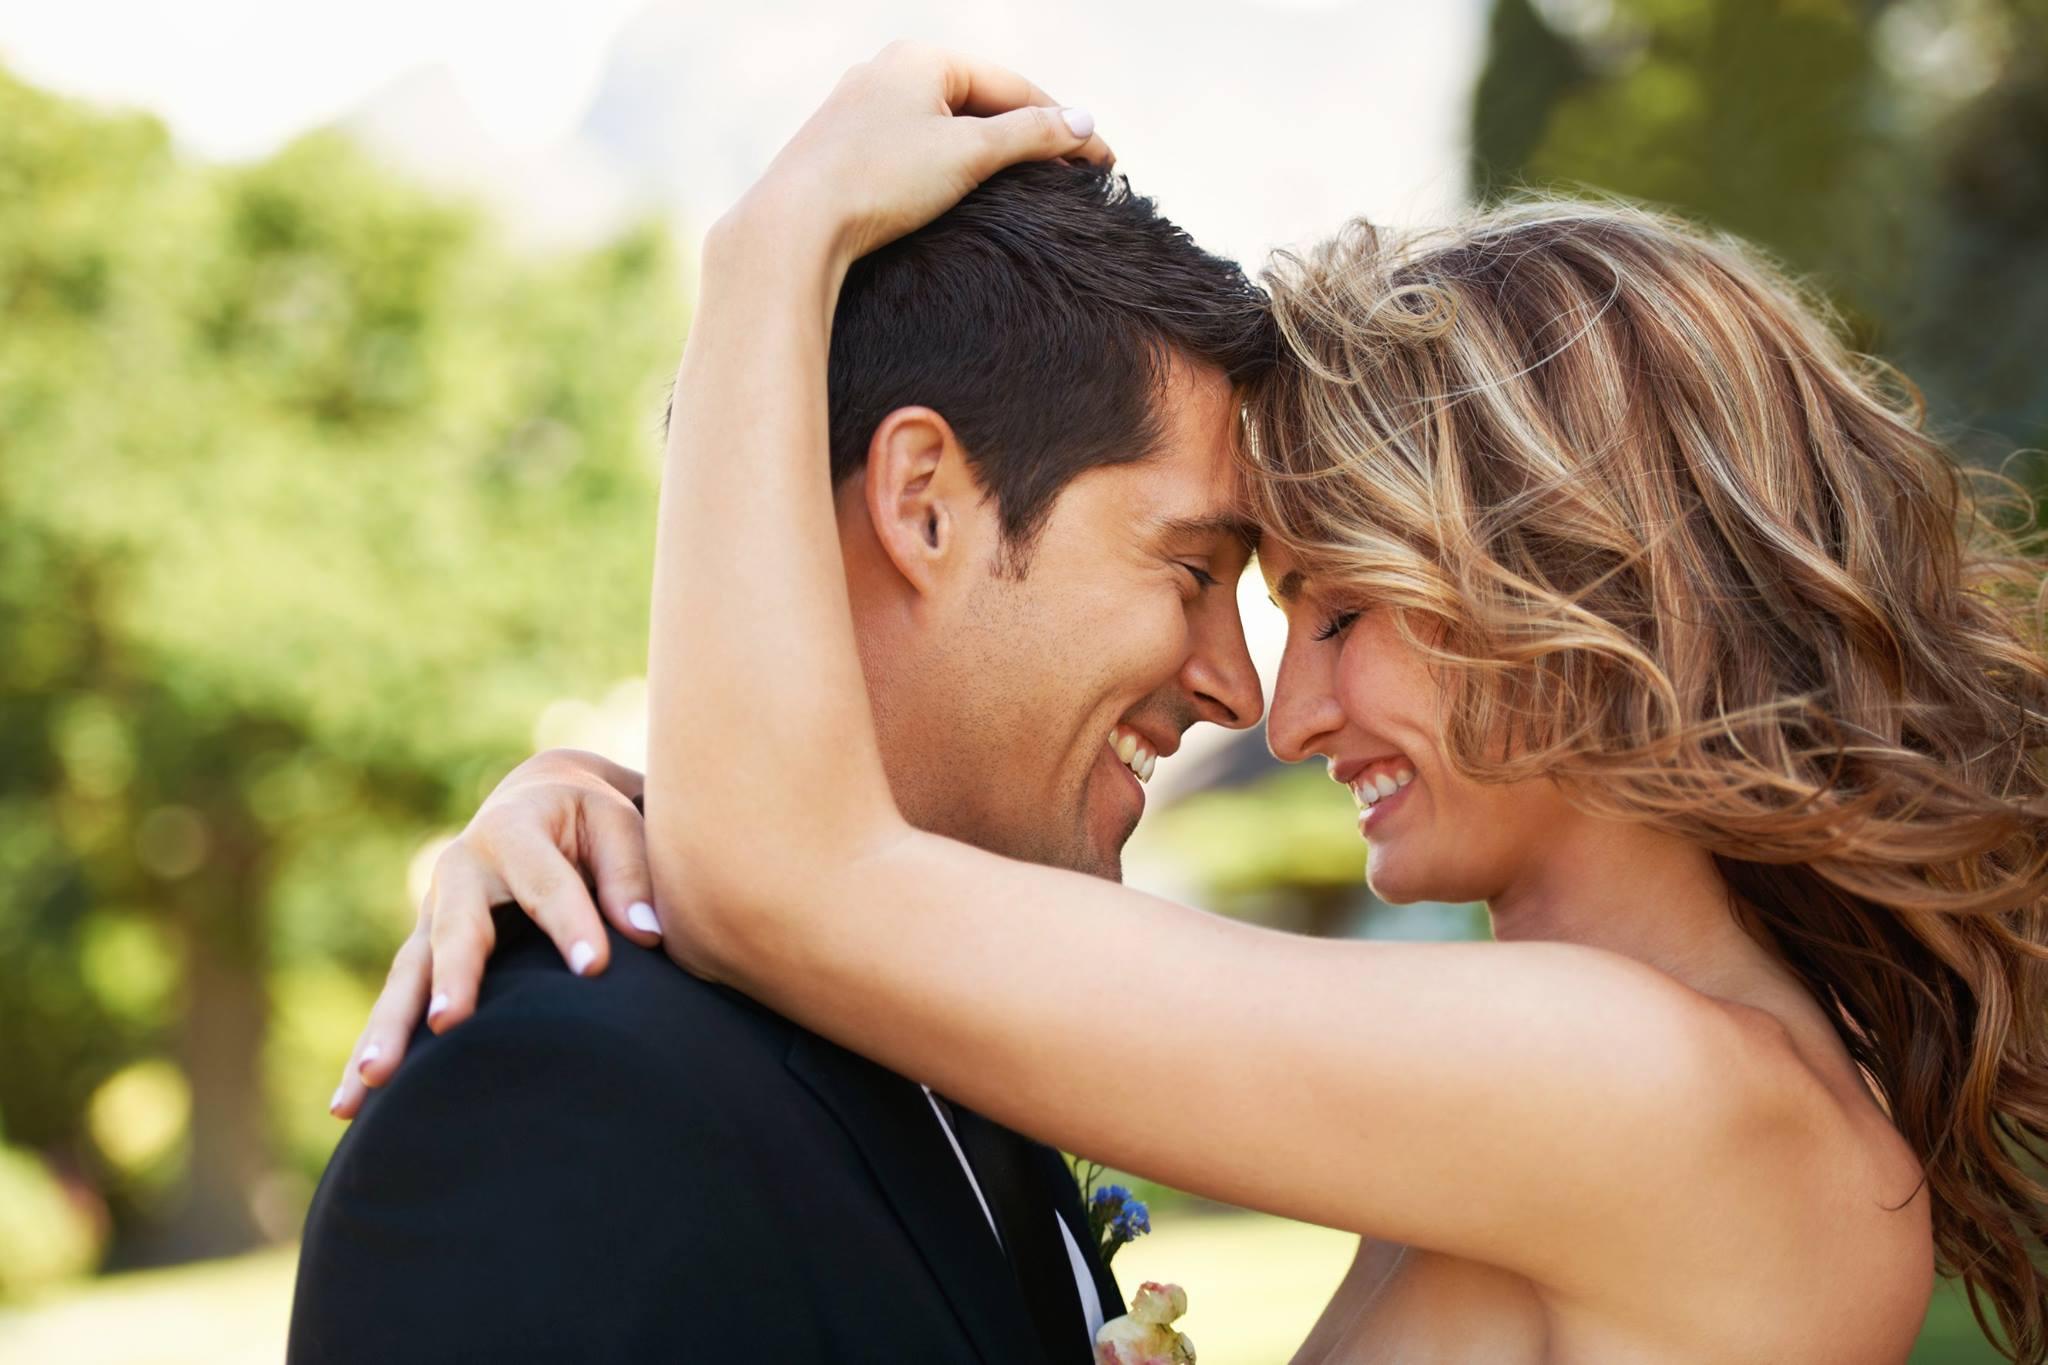 صور عريس وعروسه يوم الزفاف 10 صور عريس وعروسه يوم الزفاف